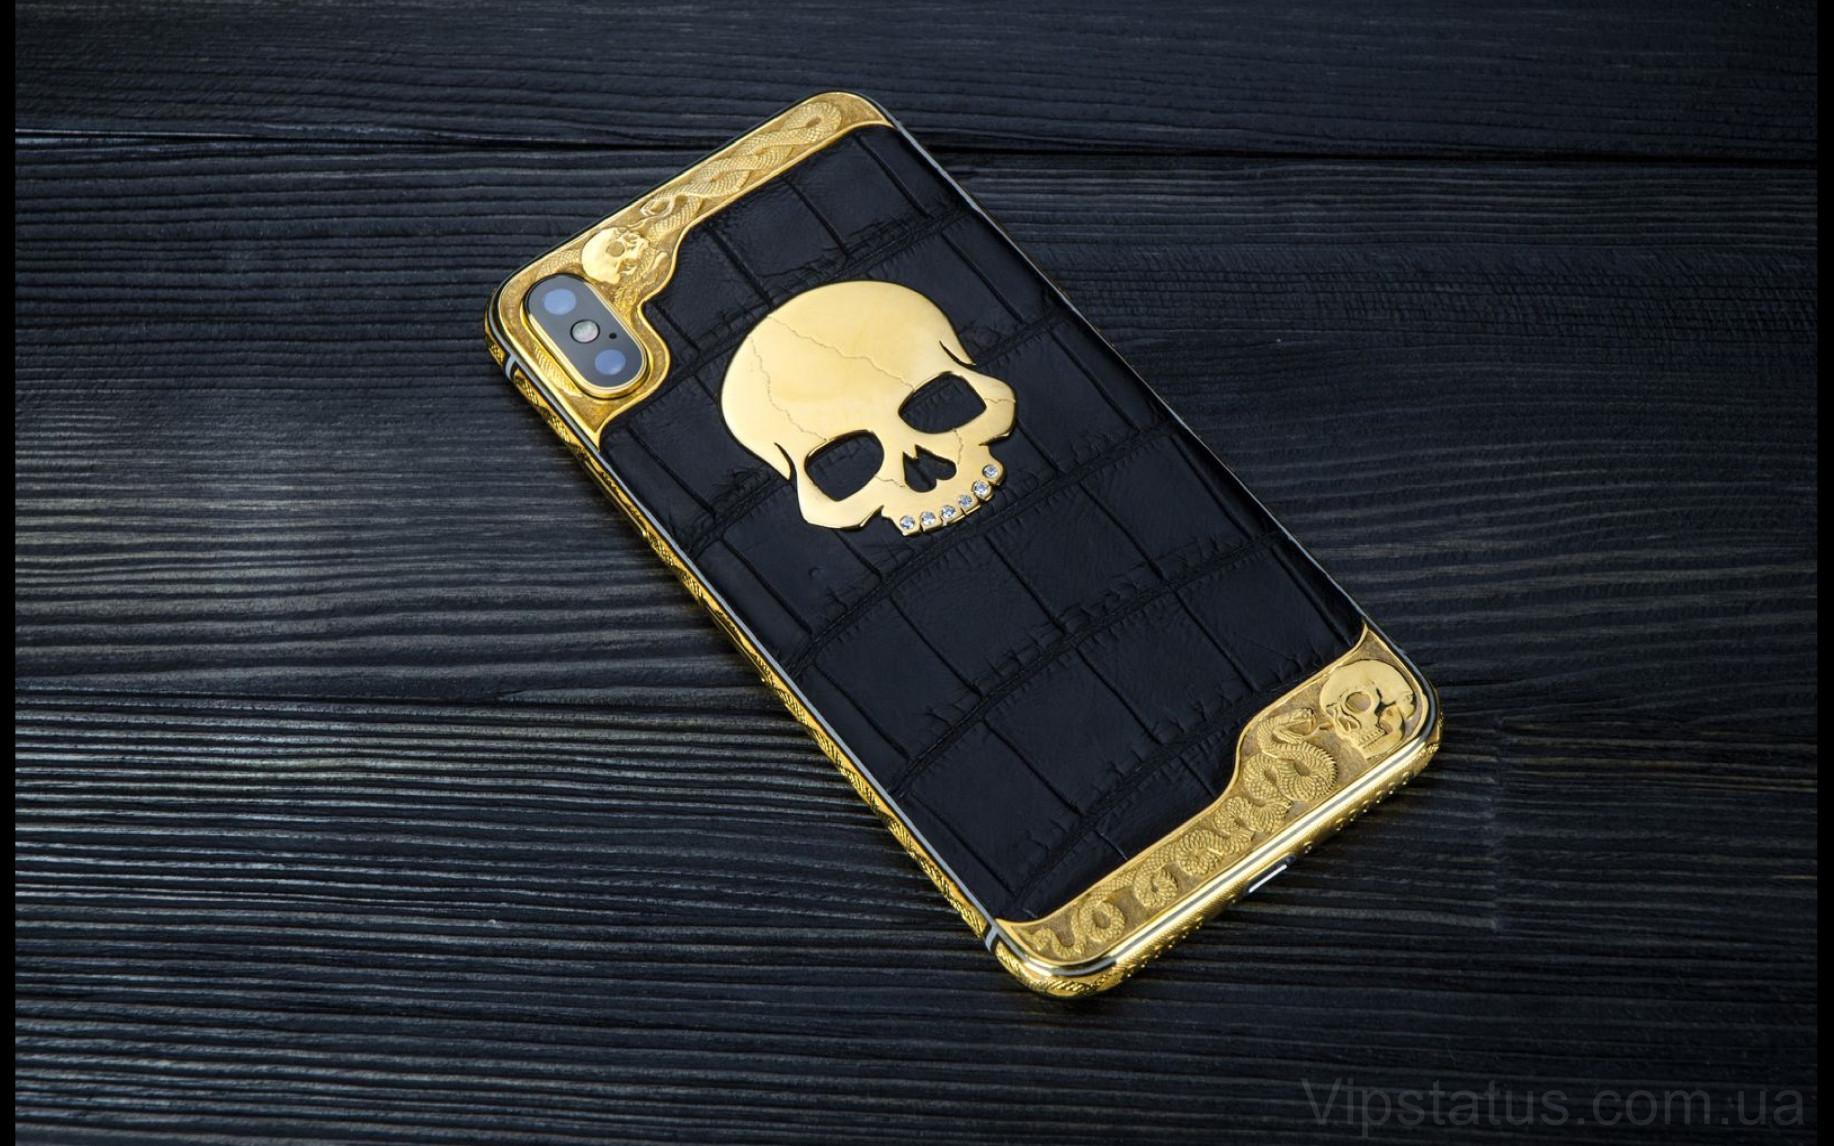 Elite Night Horror IPHONE 11 PRO 512 GB Night Horror IPHONE 11 PRO 512 GB image 10